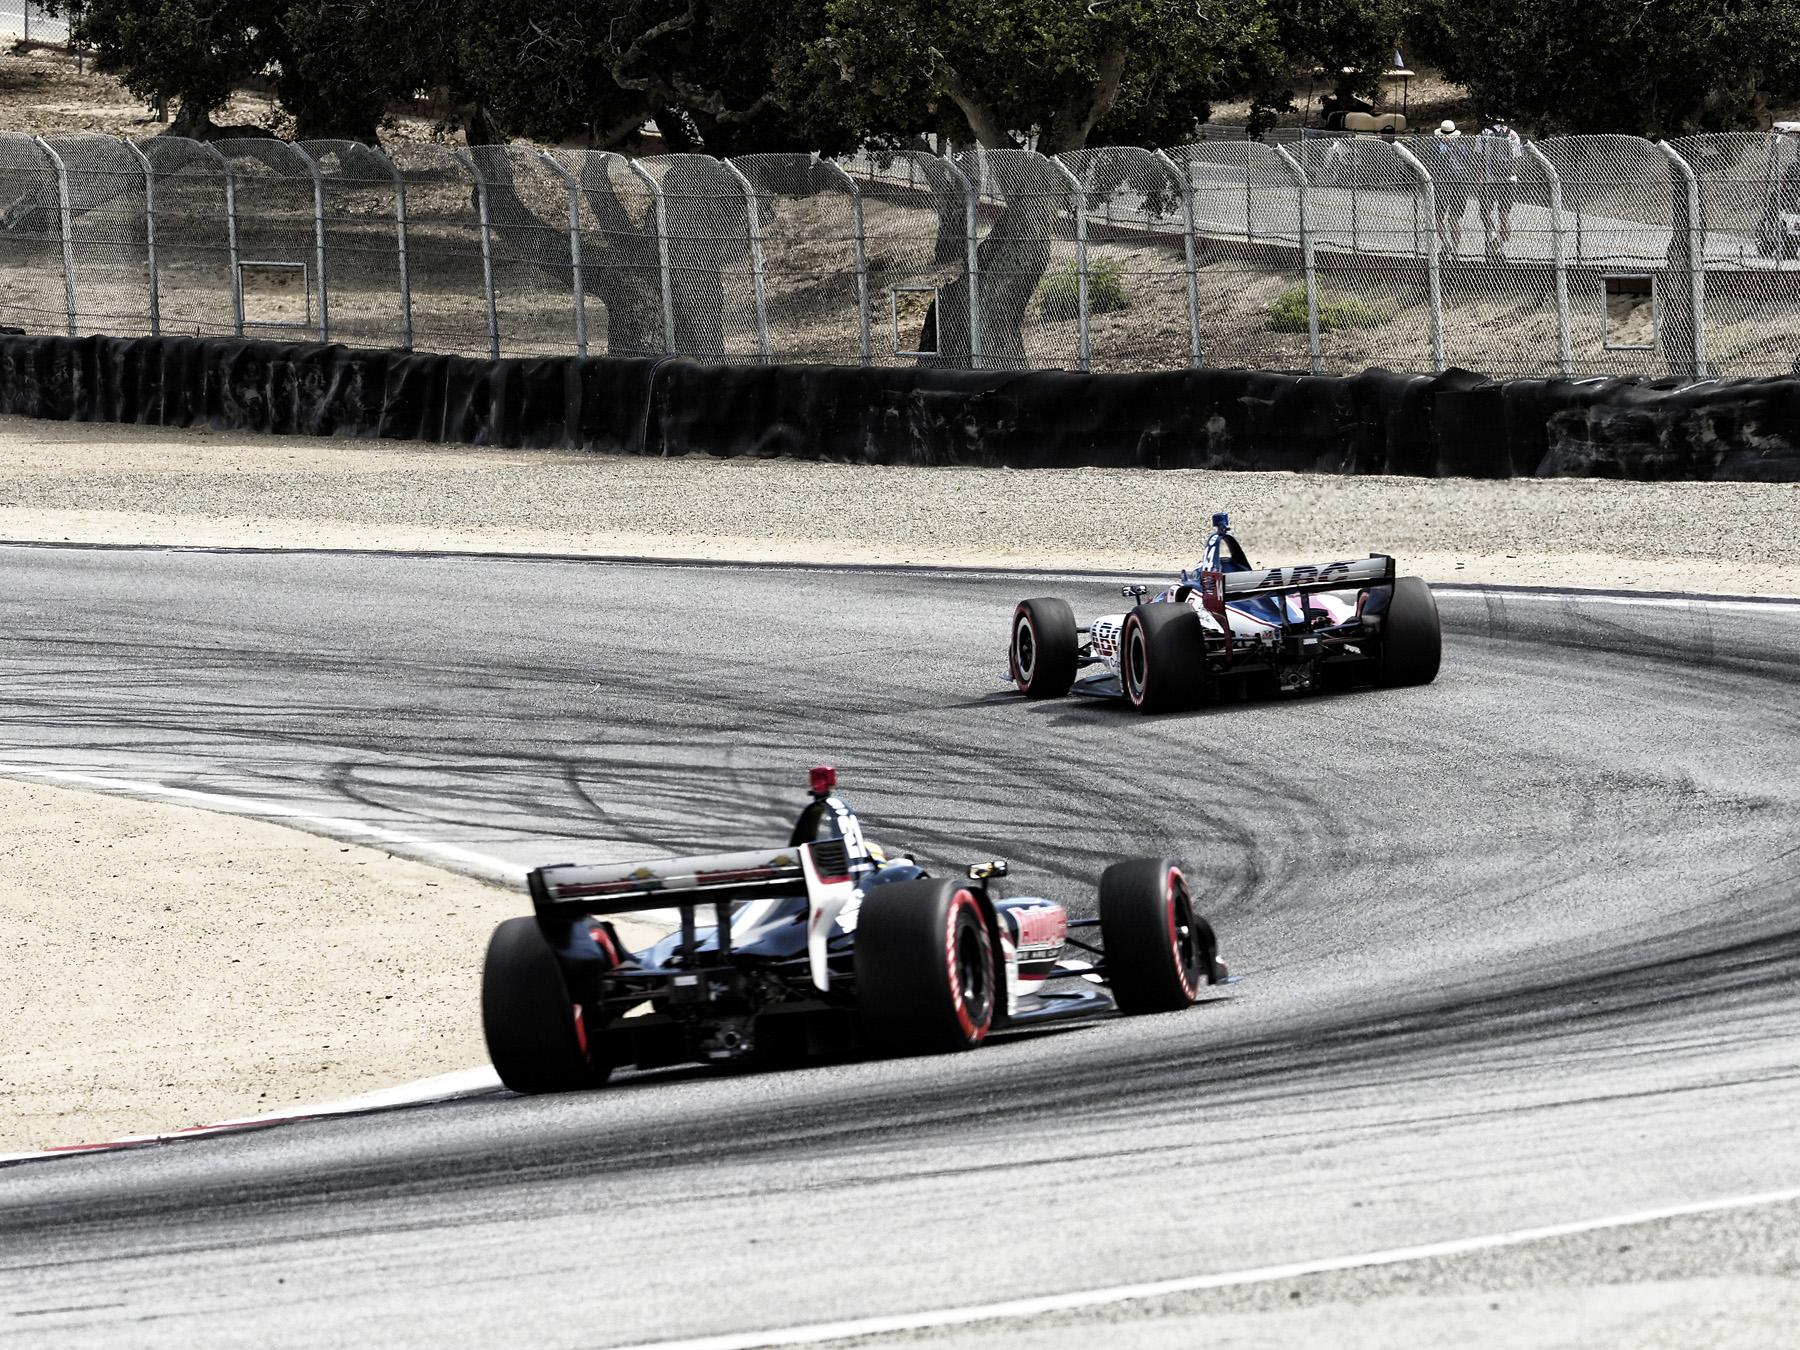 IndyCARs exiting Laguna Seca Turn 5